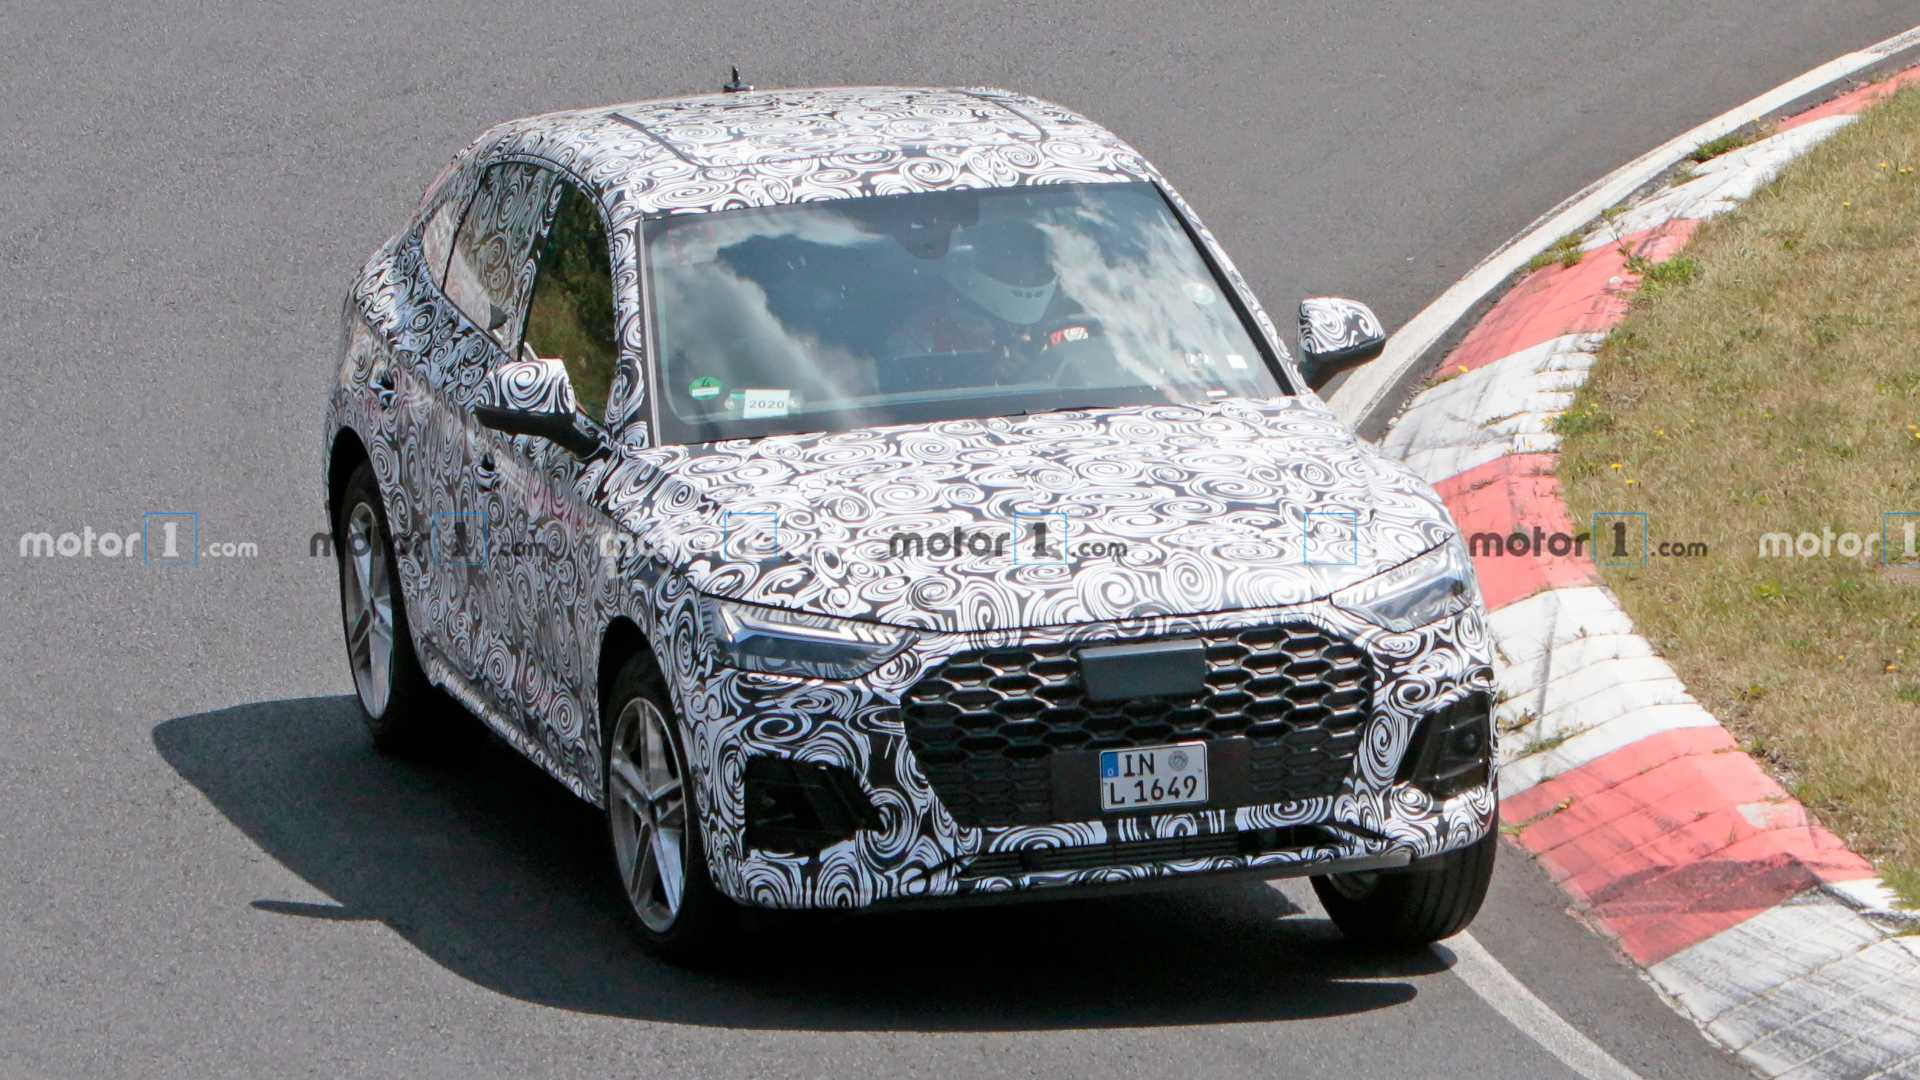 2020 - [Audi] Q5 Sportback - Page 7 2021-audi-q5-sportback-spy-shot